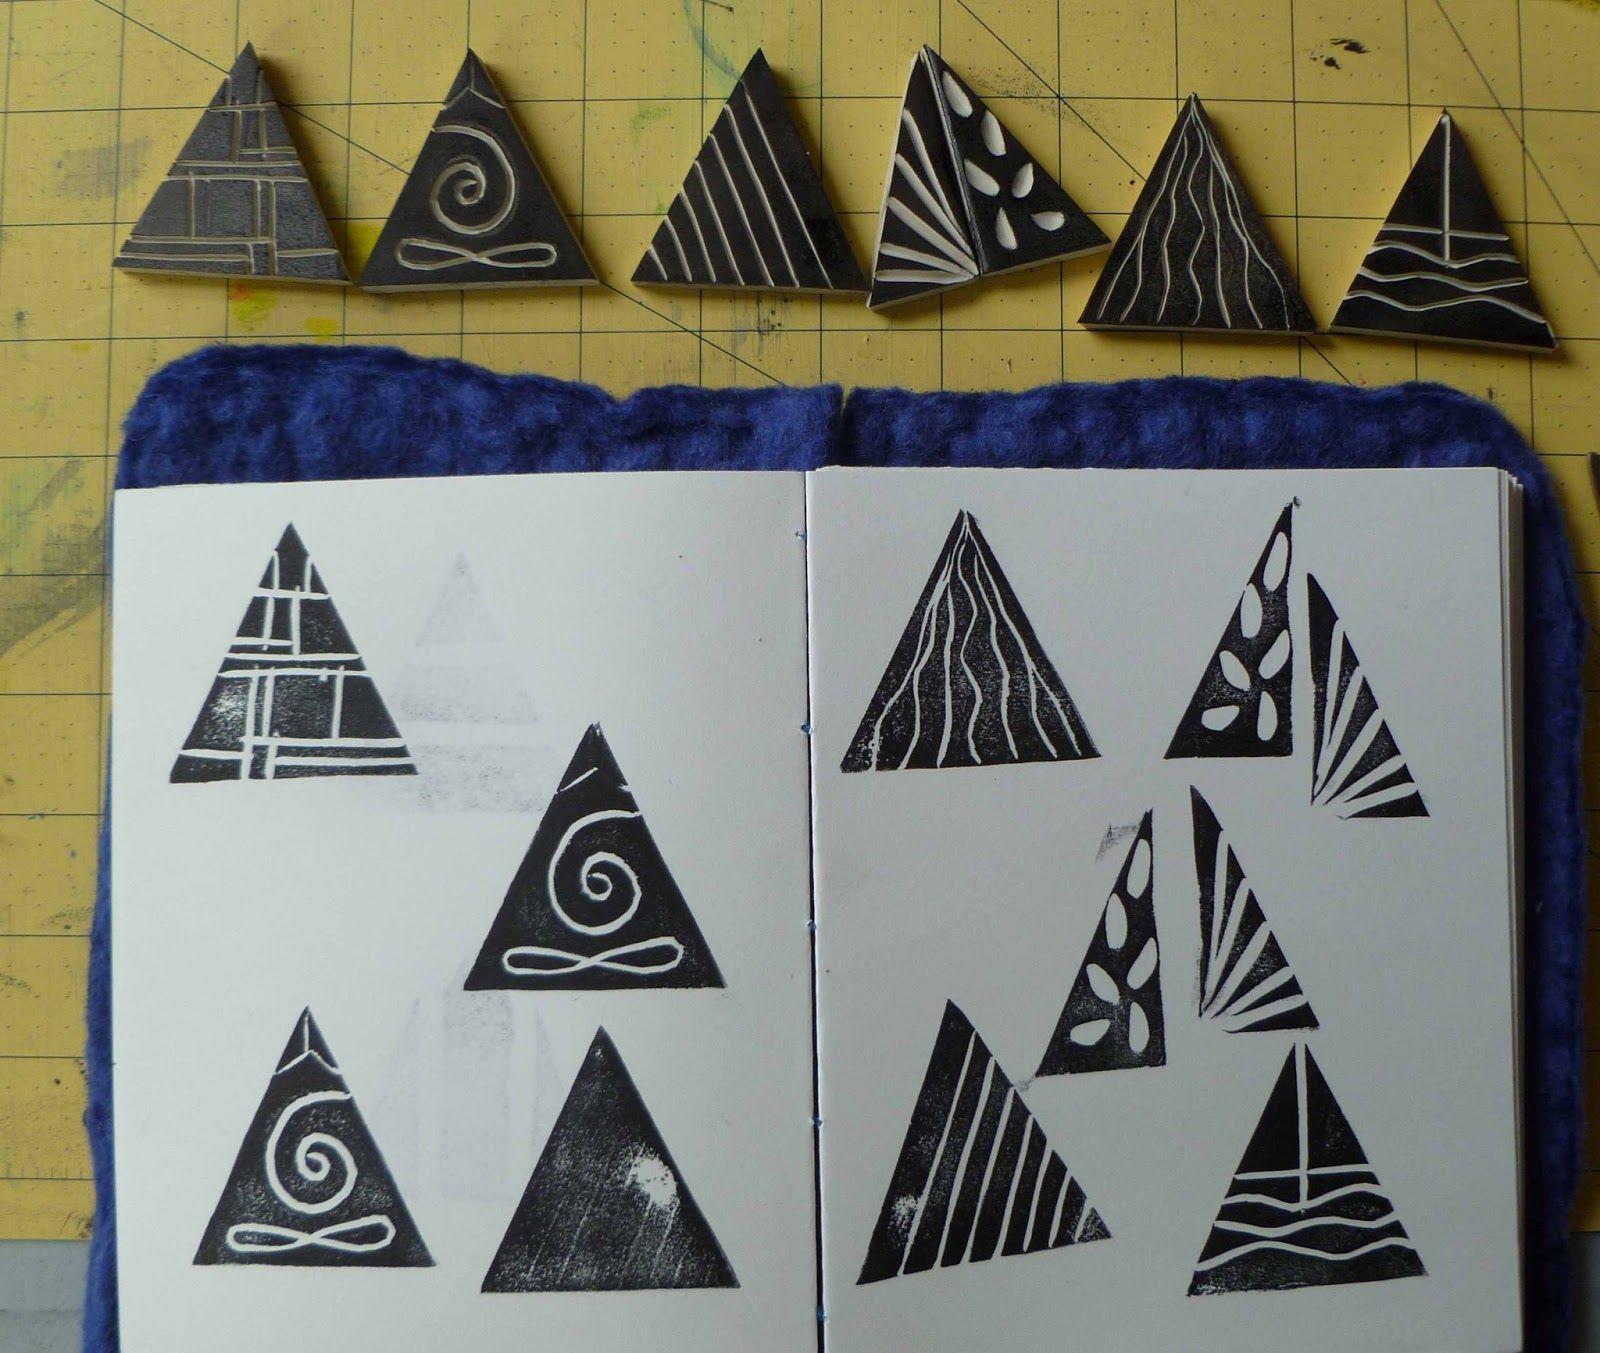 sew sew art: Visual Exercise 2